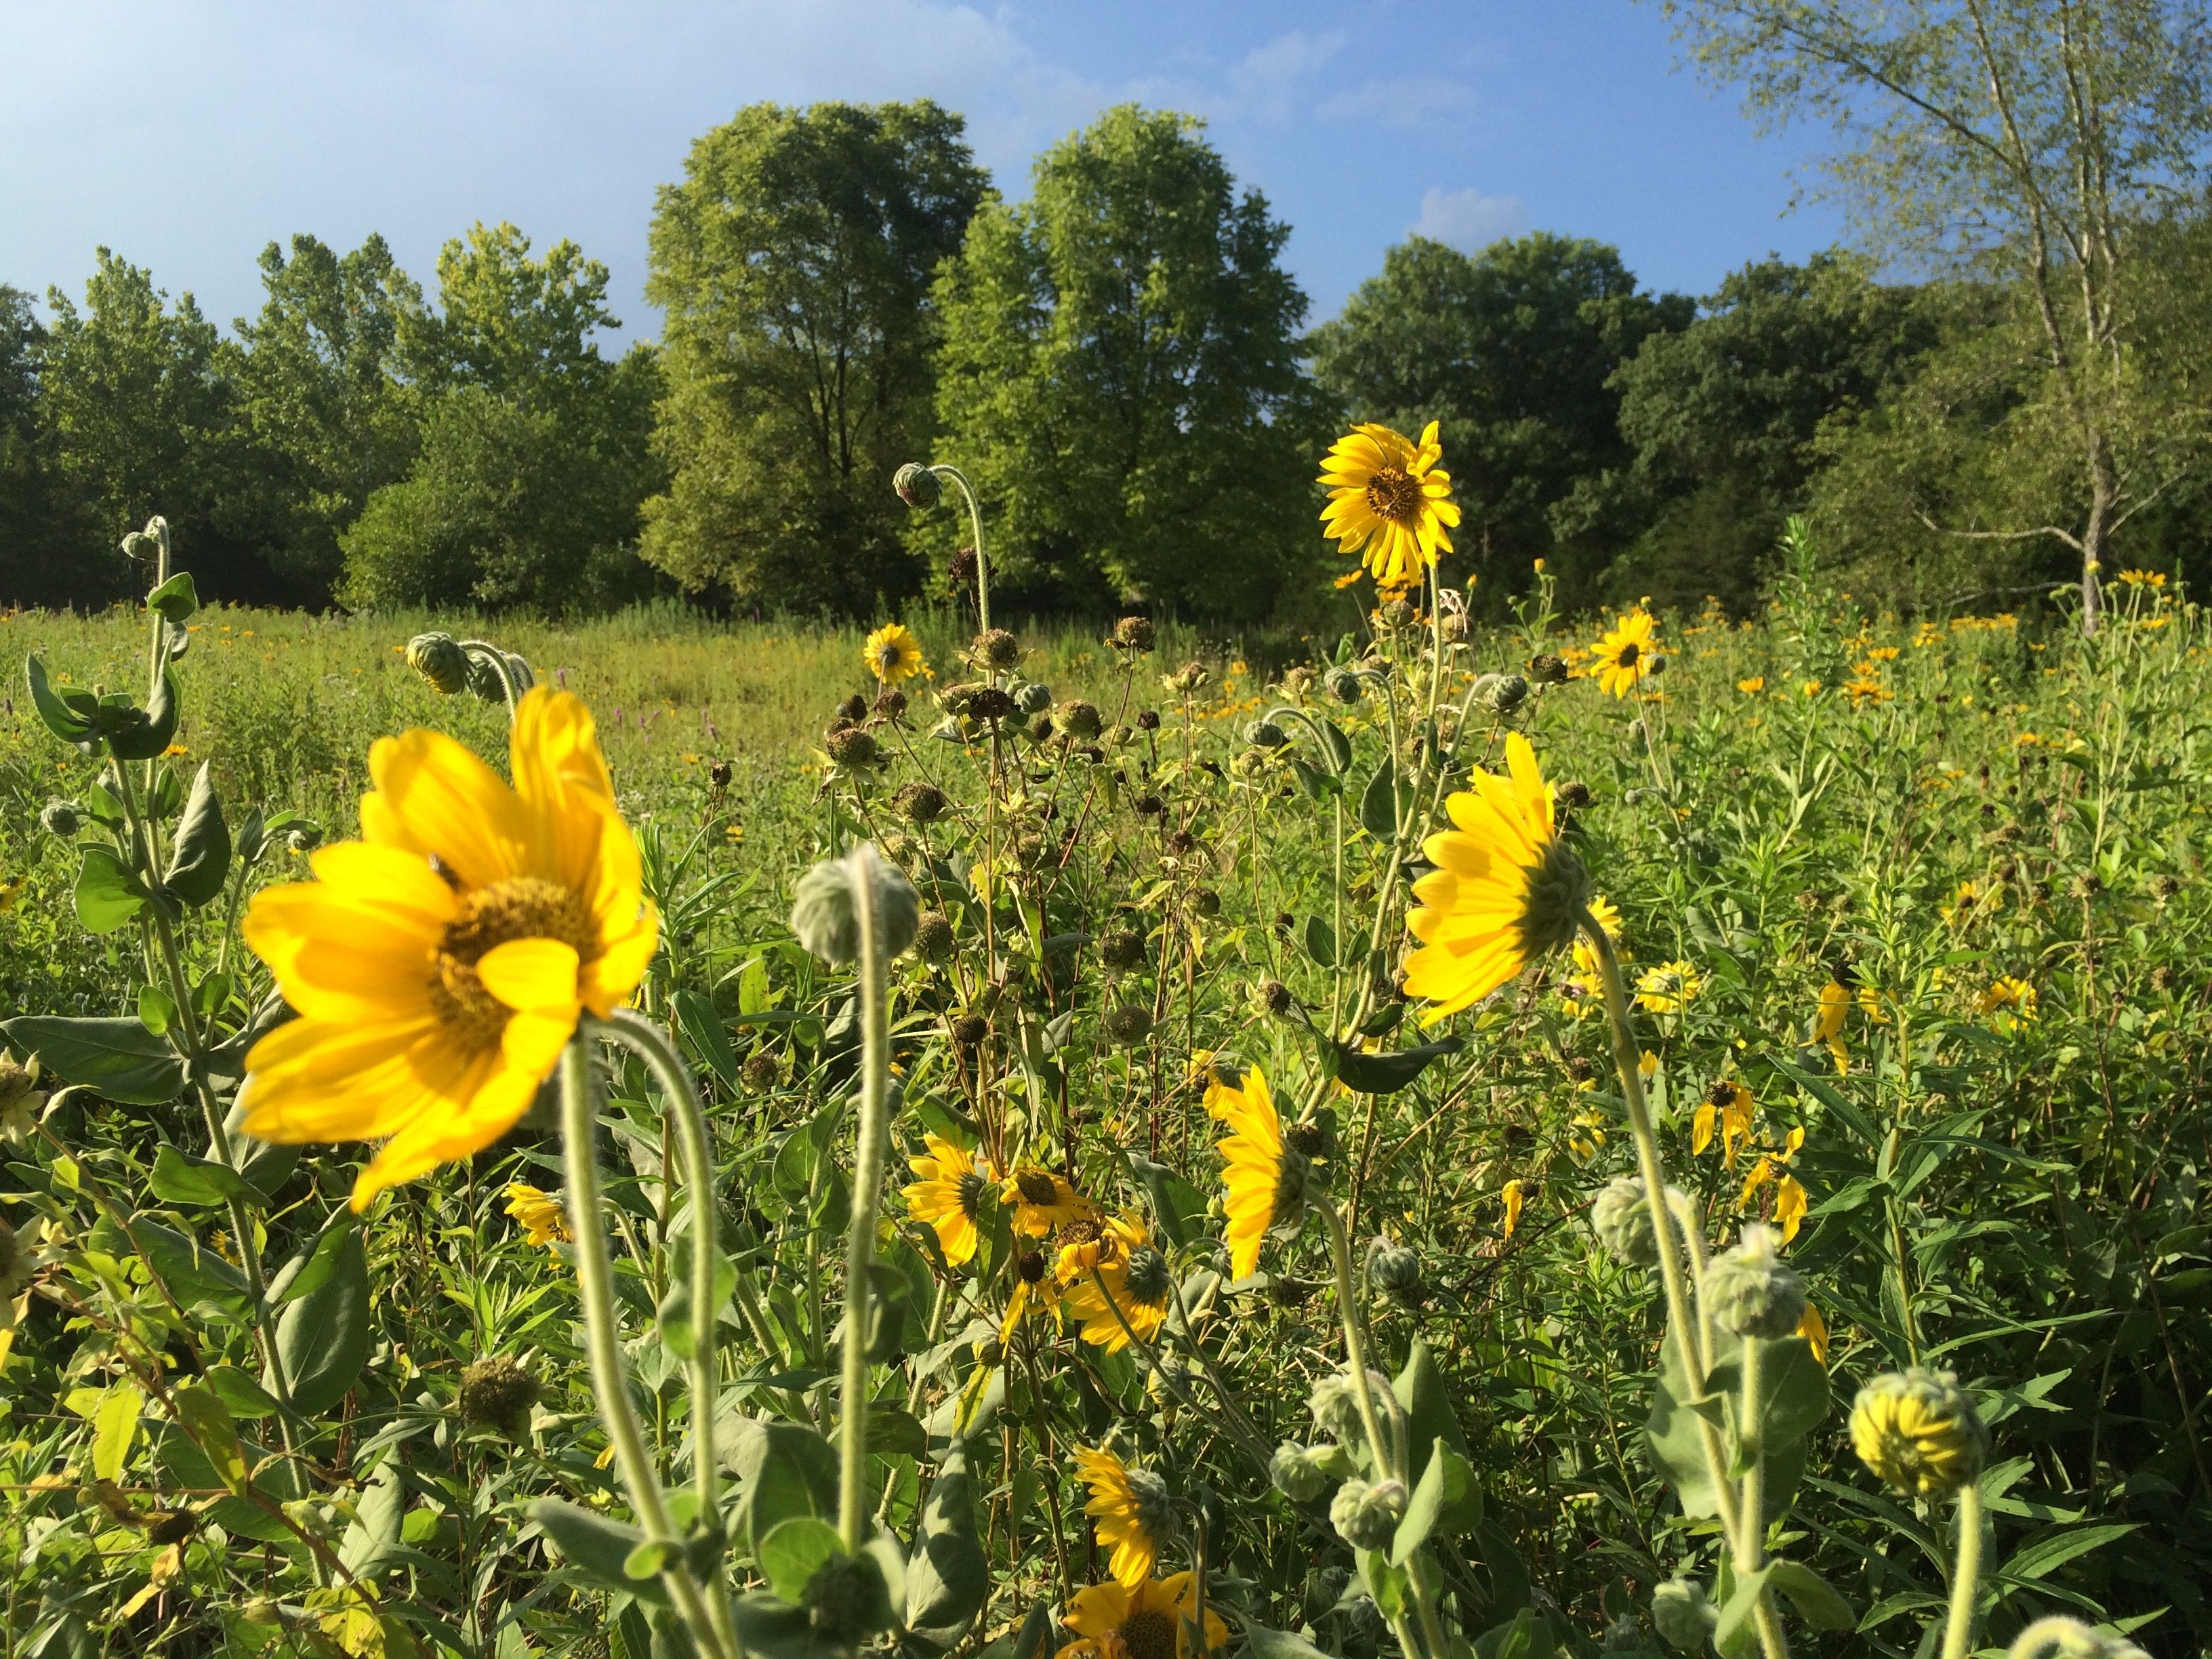 Mandalas In the Prairie. http://goo.gl/4x4Cuj - We walked the prairie, found inspiration & created mandalas